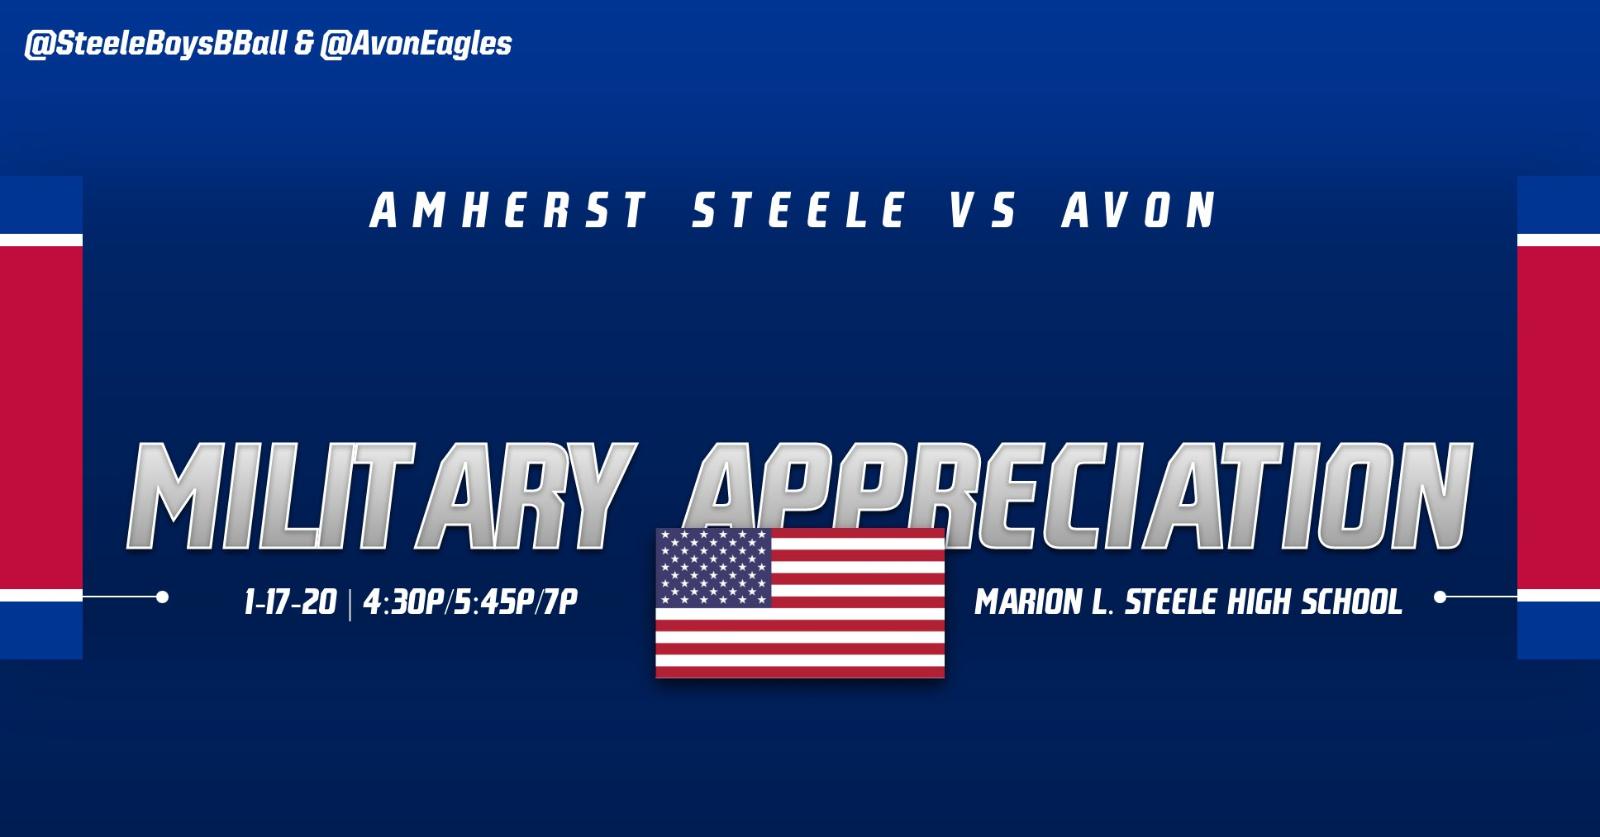 Military Appreciation Night at Basketball on Friday January 17th